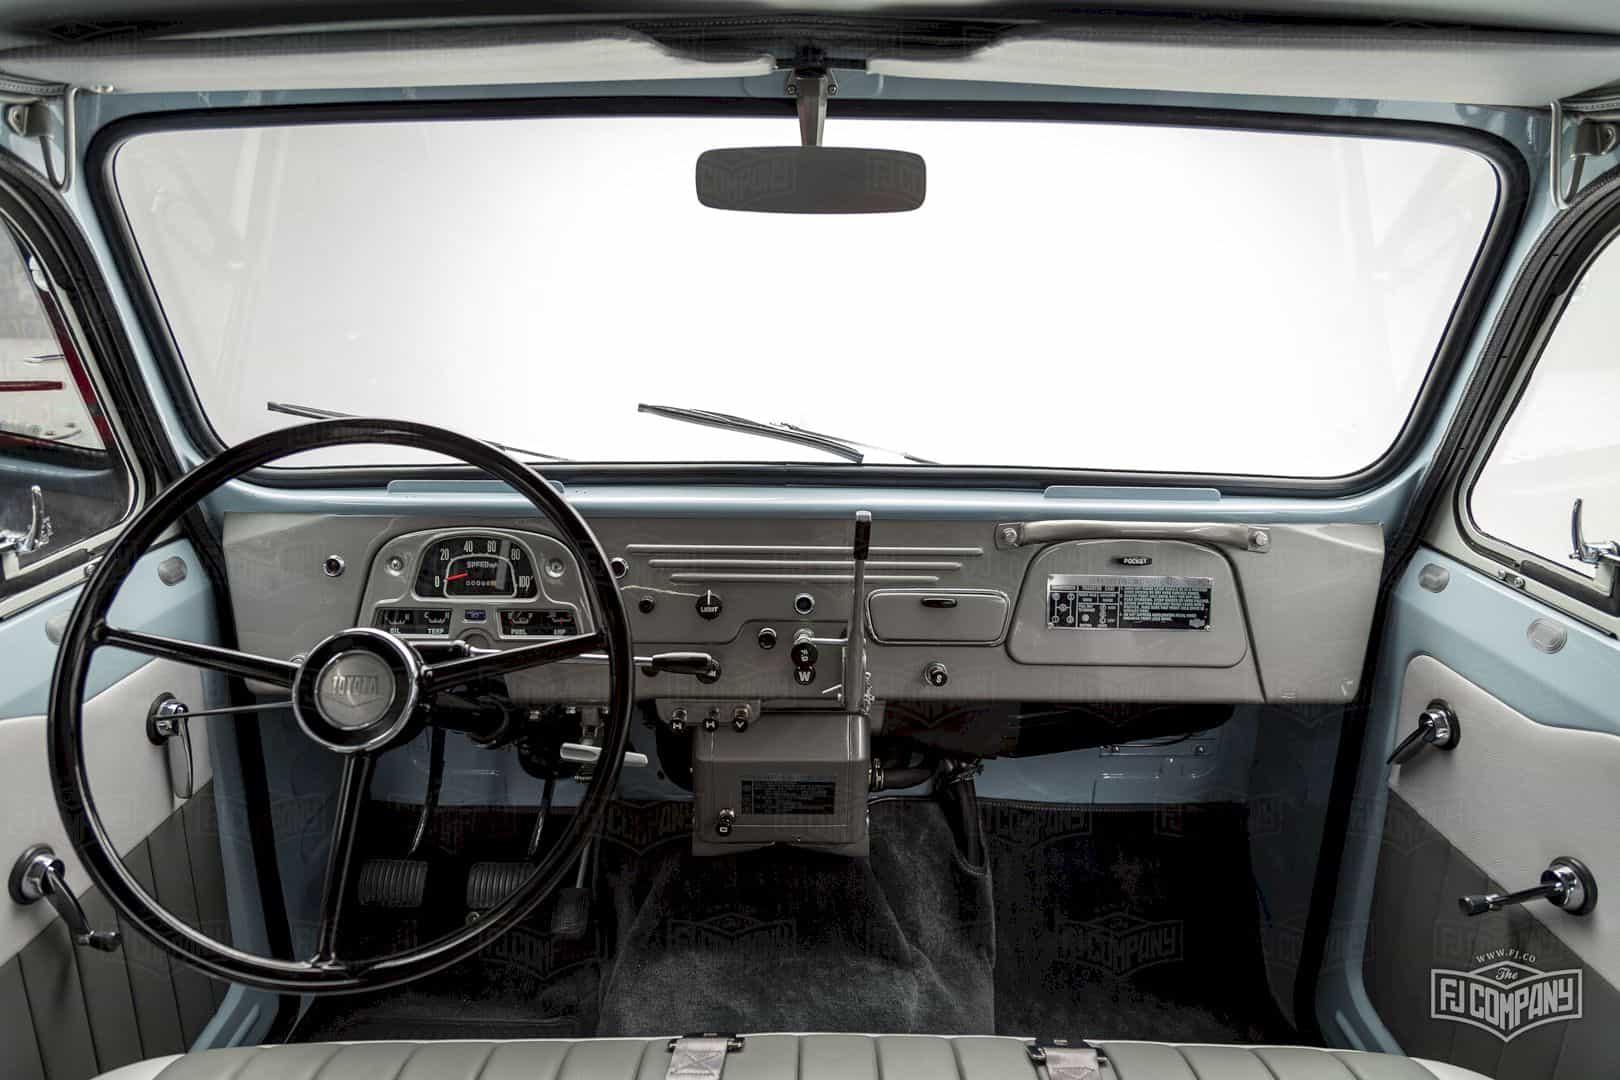 1967 Toyota Land Cruiser Fj45lv Capri Blue 4